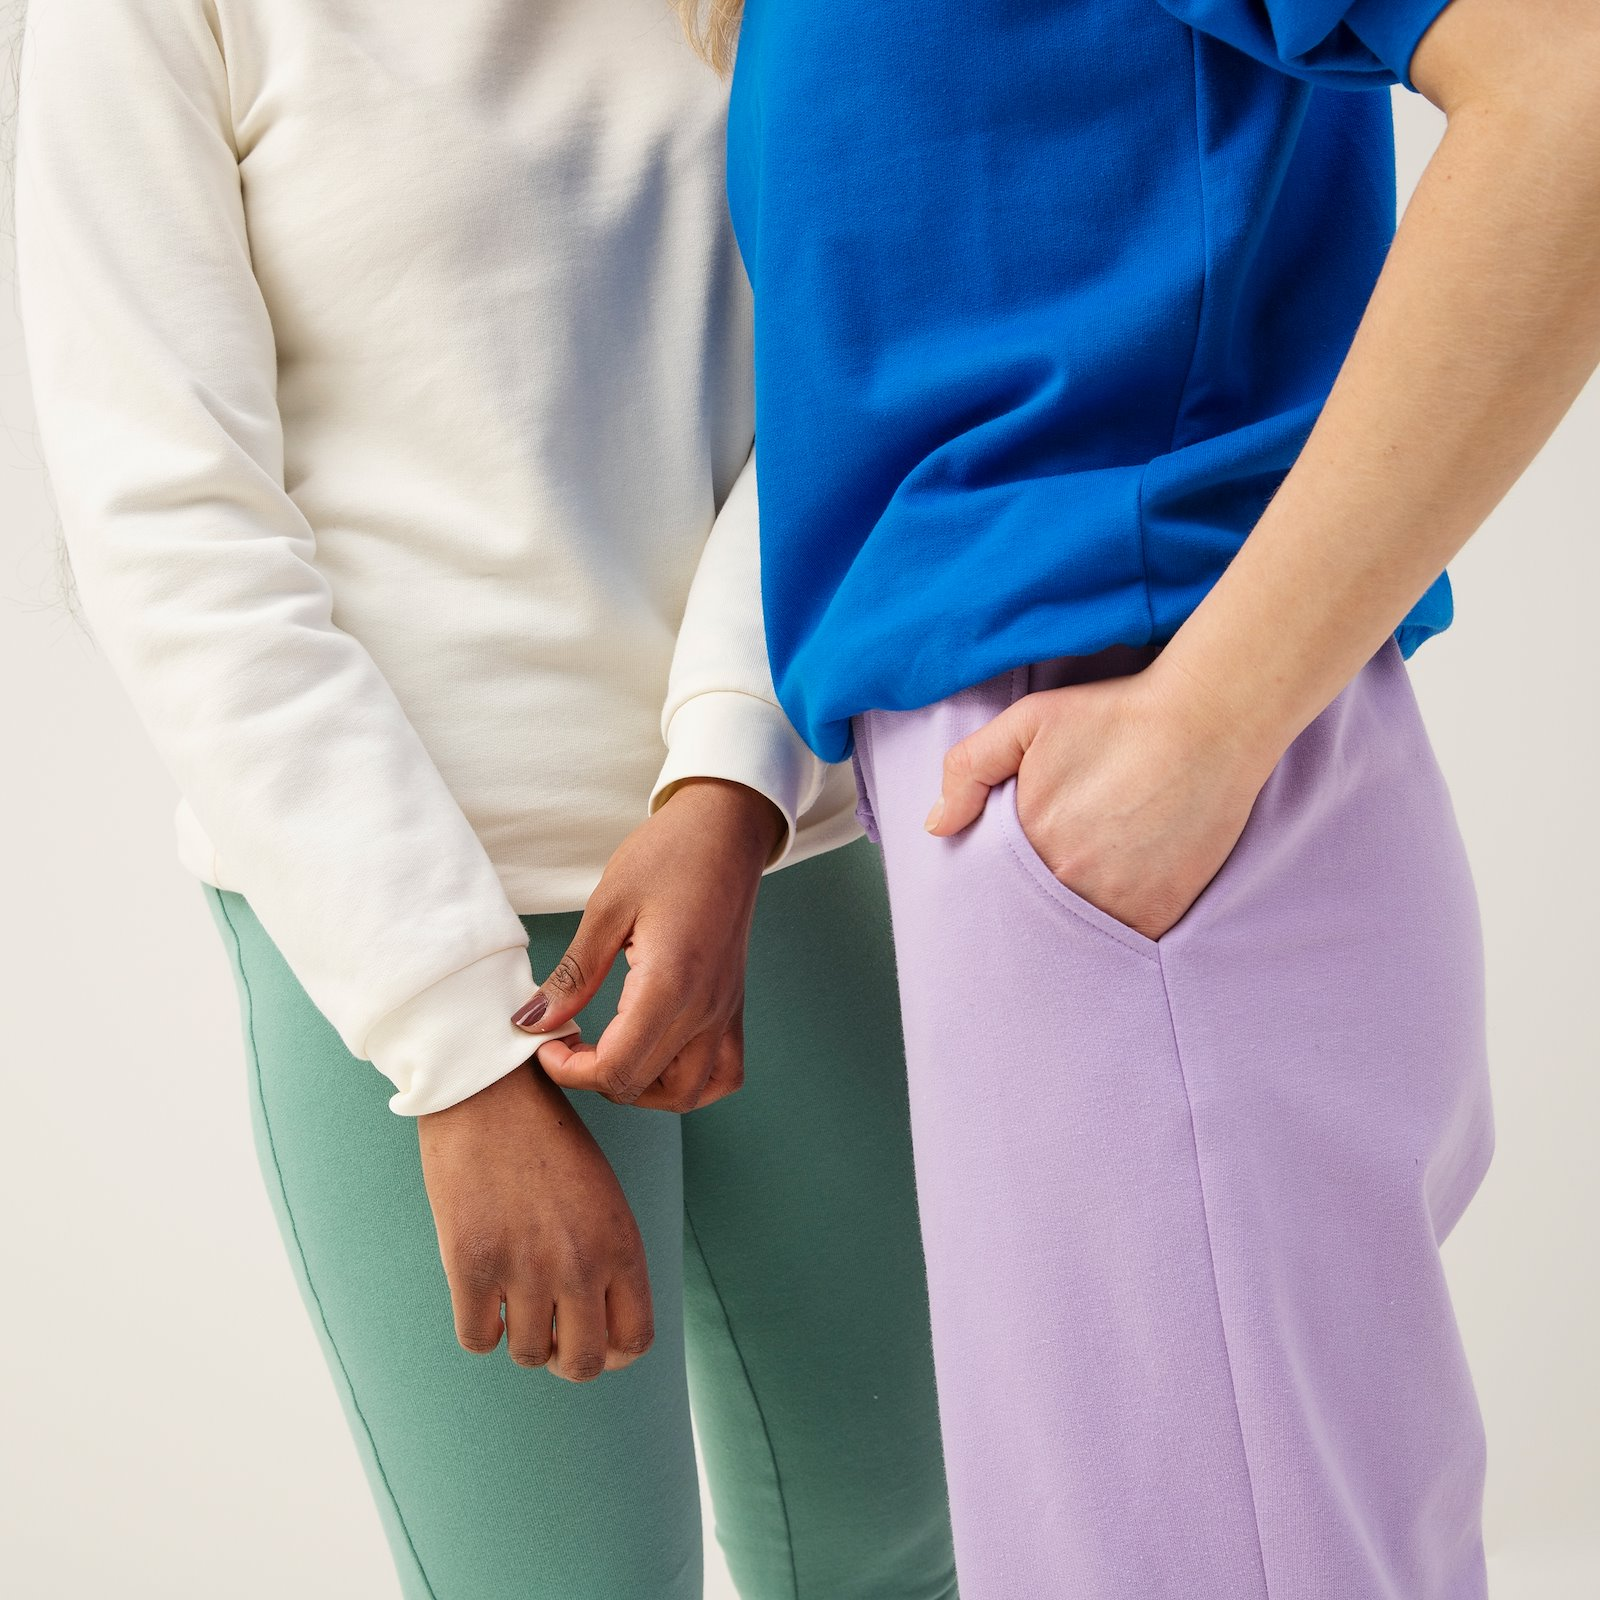 Sweatshirt with puff sleeves, M p22074_211744_p20034_211757_p22073_211760_230635_p20051_211768_bundle